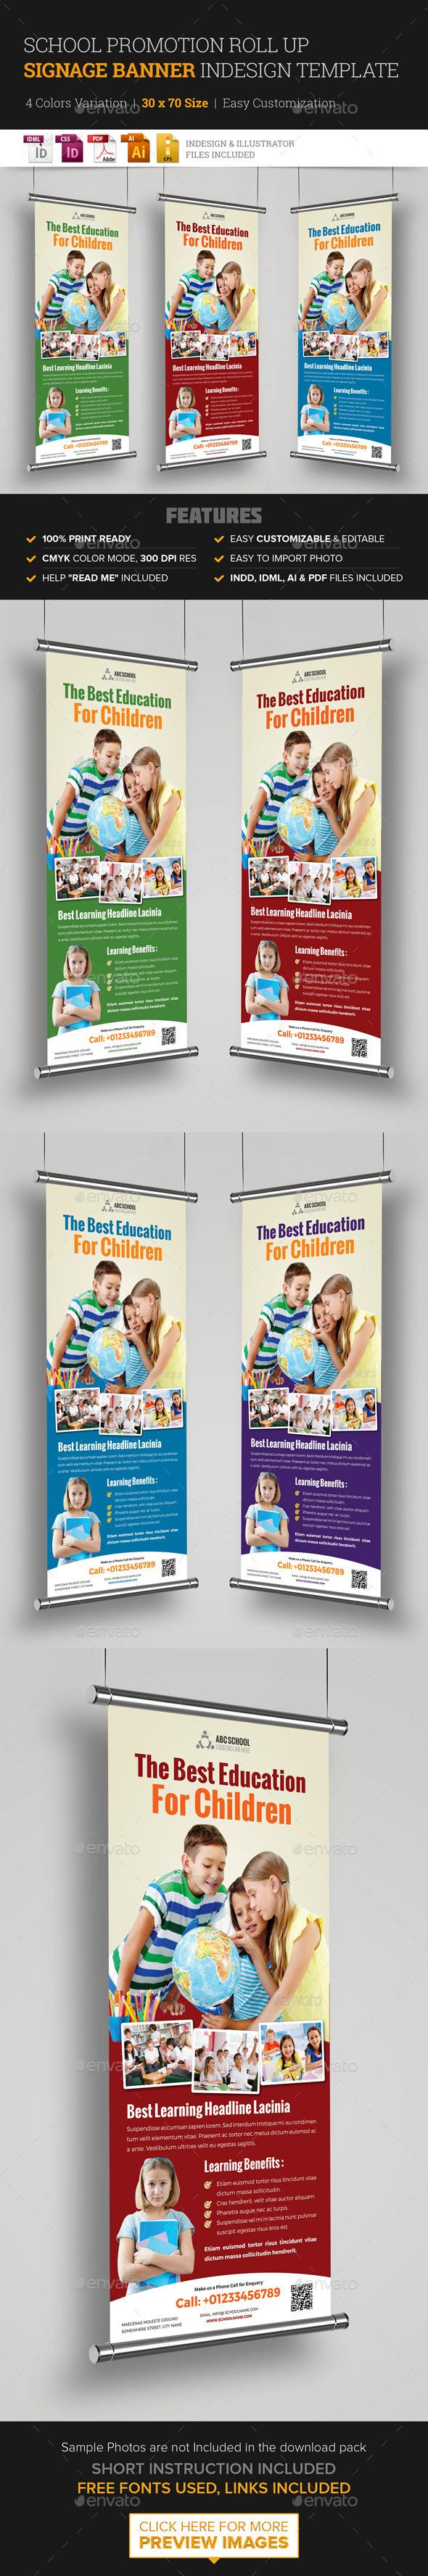 School Promotion Roll Up Banner Signage InDesign - Signage Print Templates